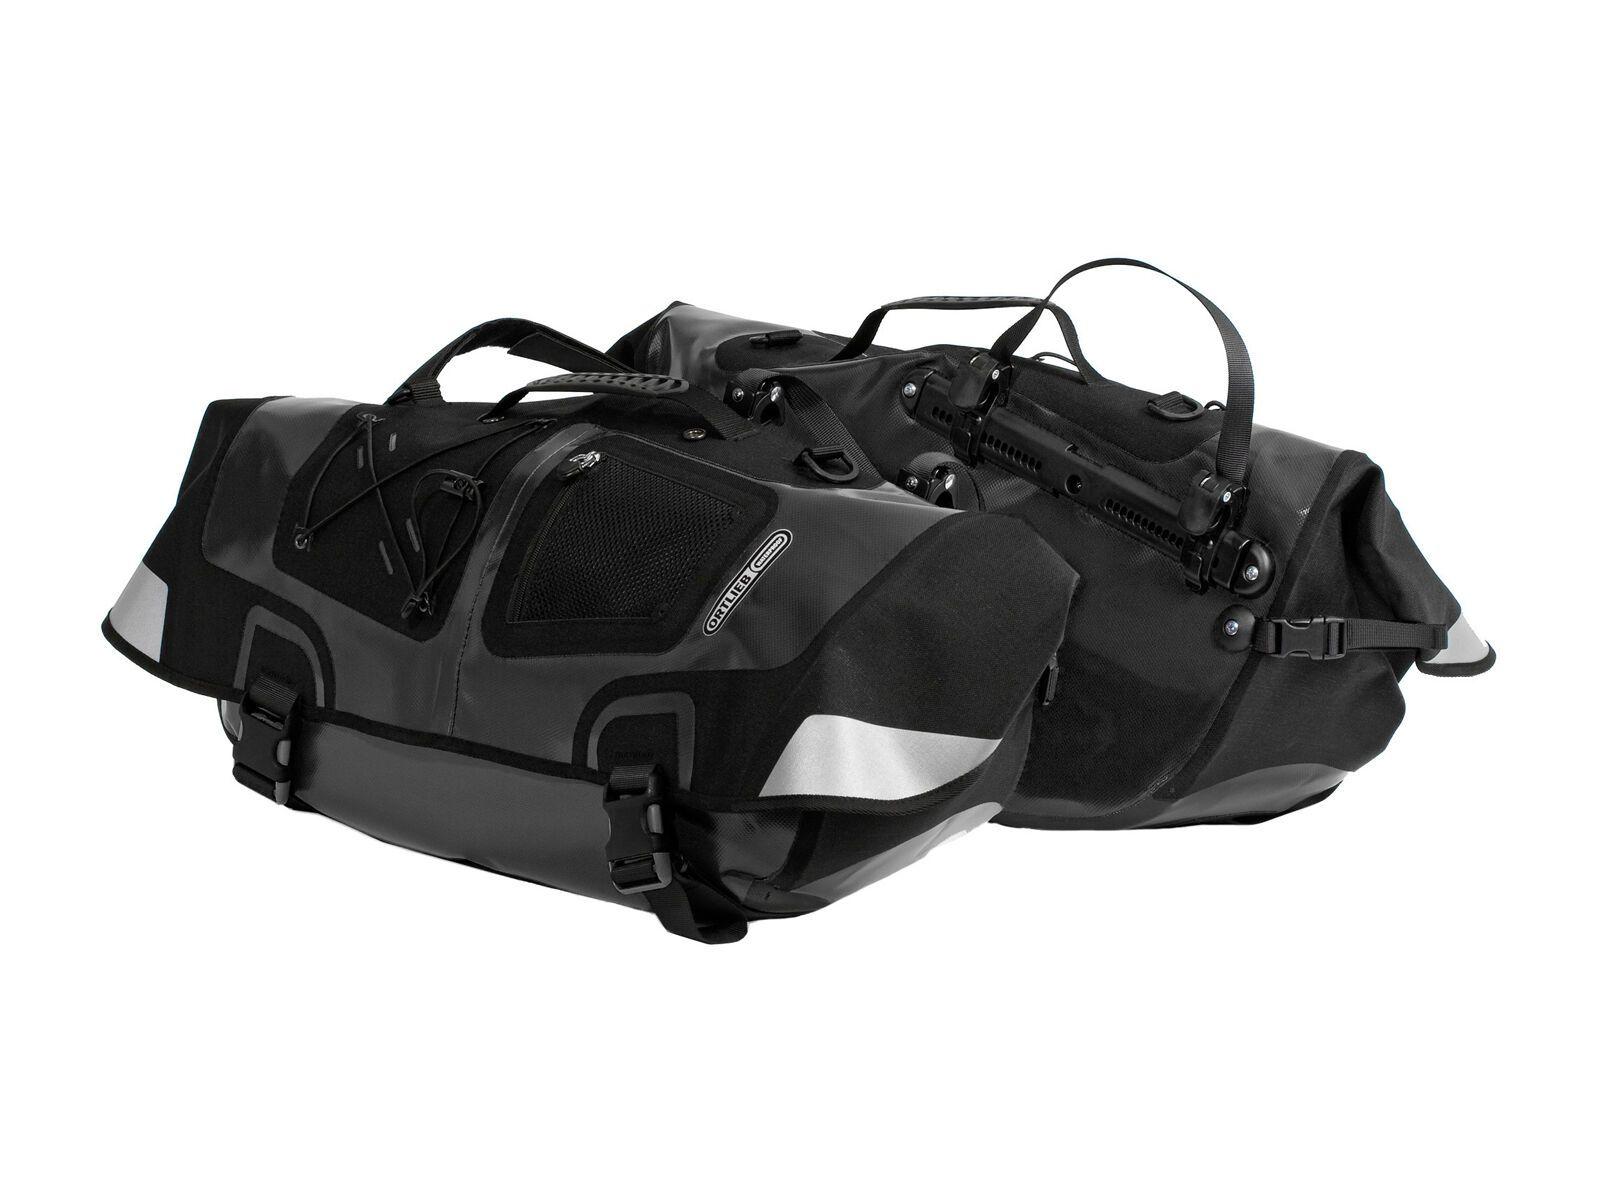 Ortlieb Recumbent-Bag / Liegeradtasche (Paar), schwarz - Fahrradtasche FL101